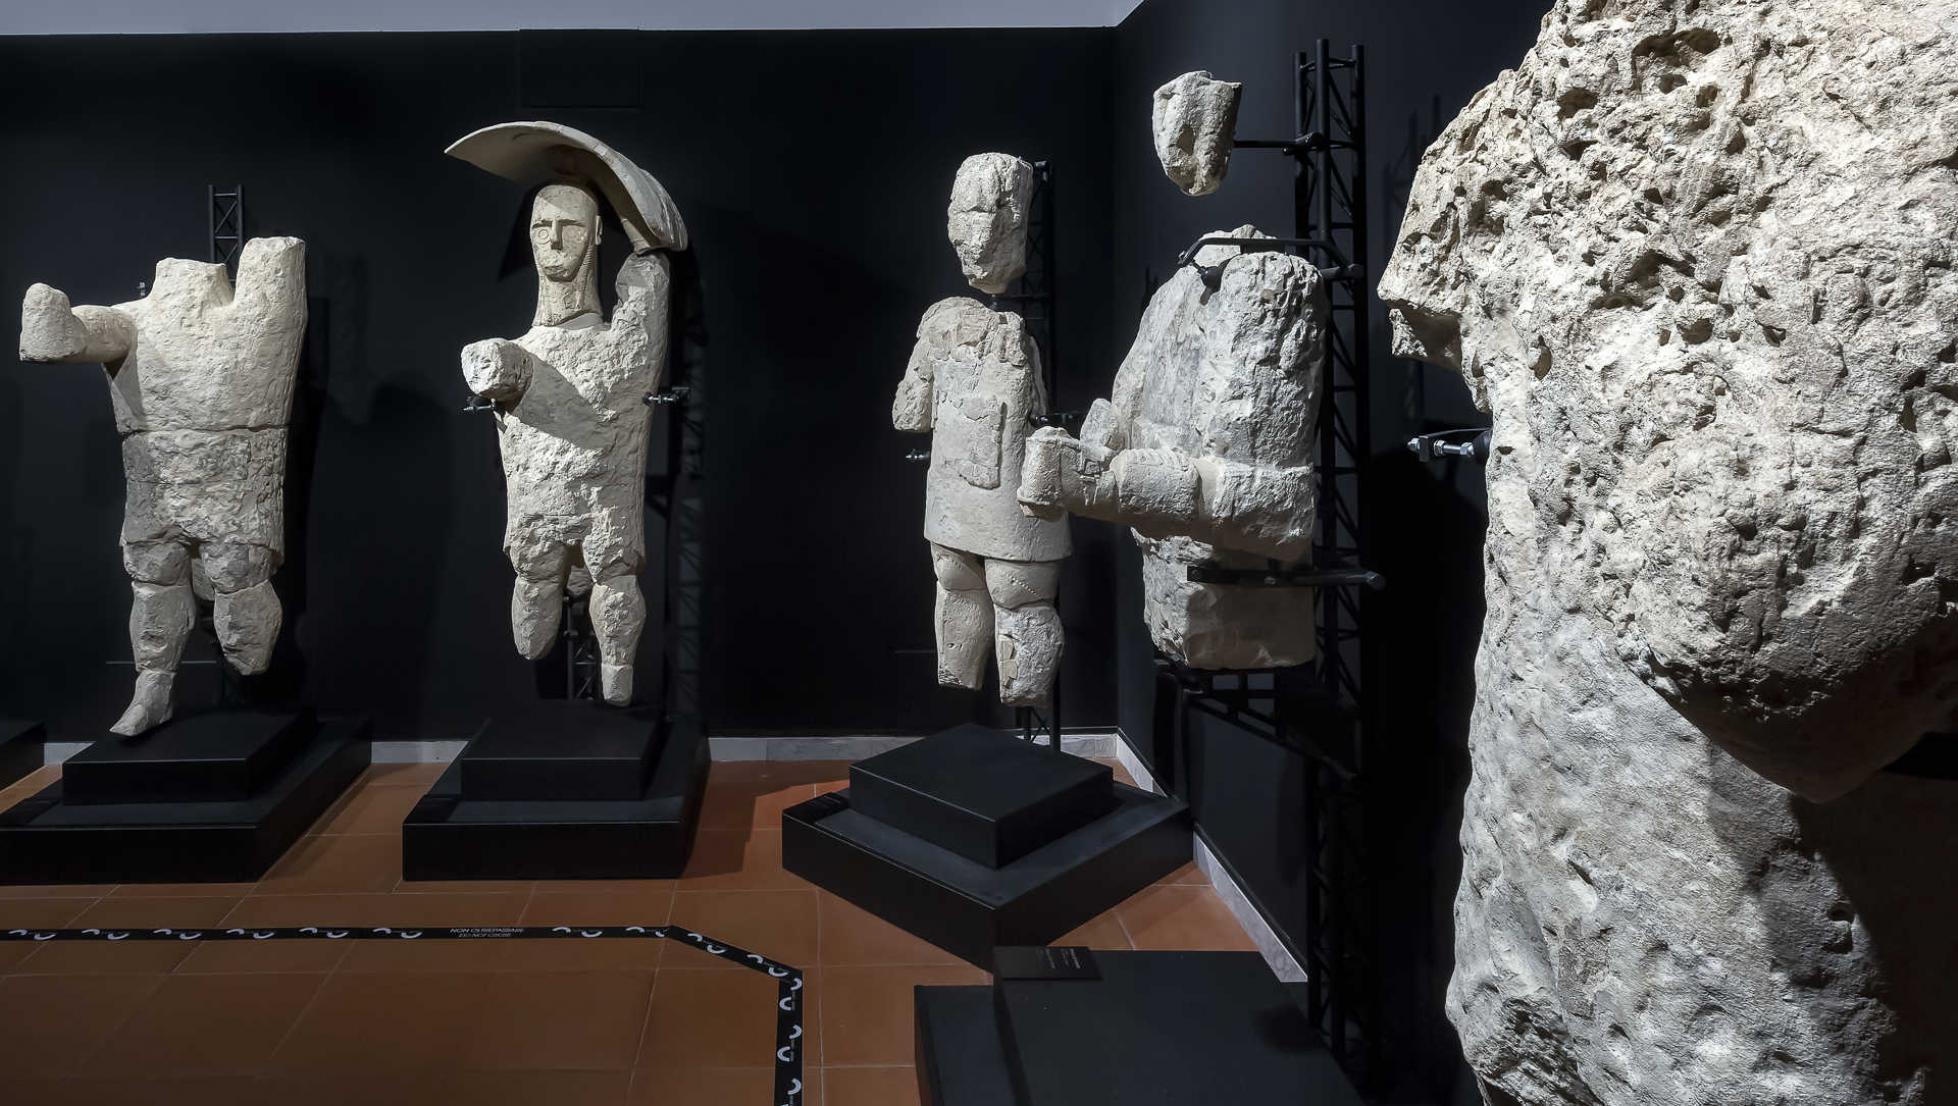 Giganti Mont'e Prama - Museo Archeologico